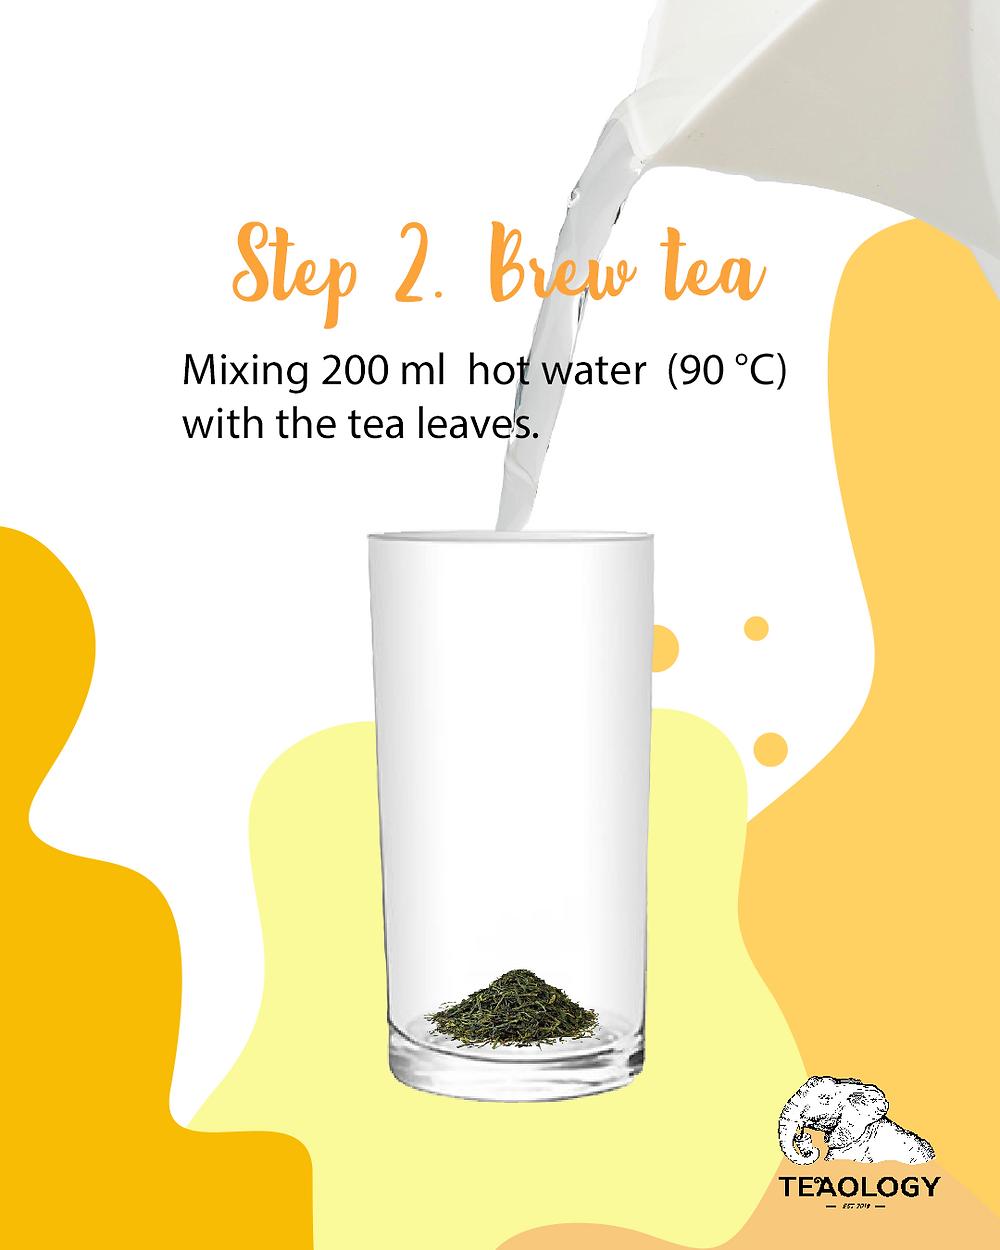 TeaOlogy - Make mango boba at home to brew tea